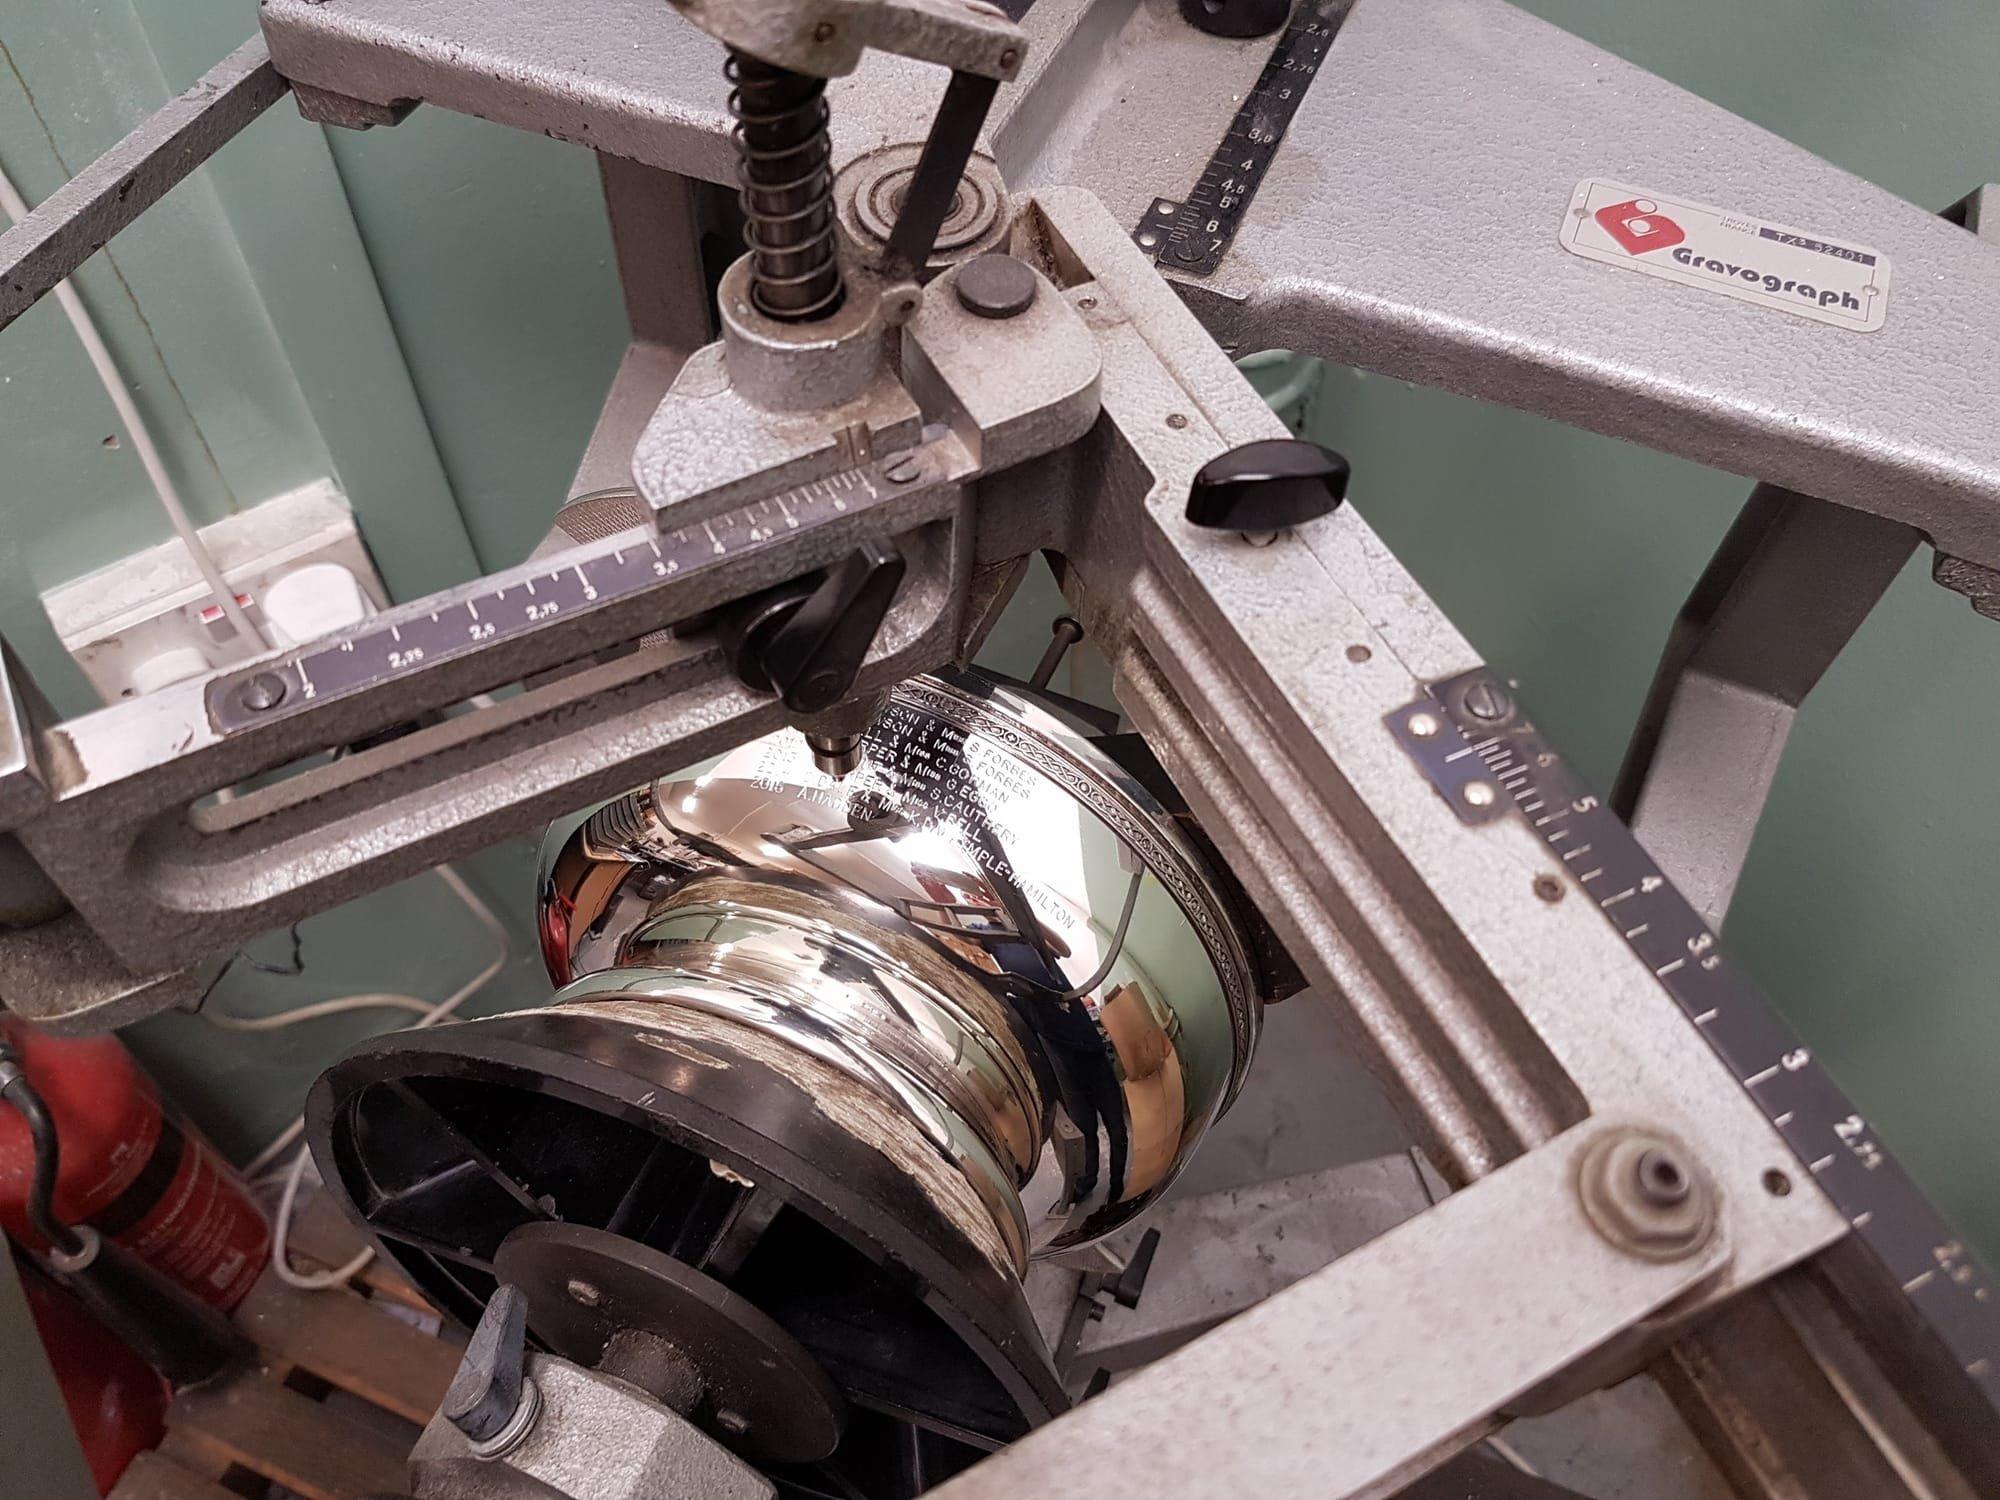 pantograph trophy engraving